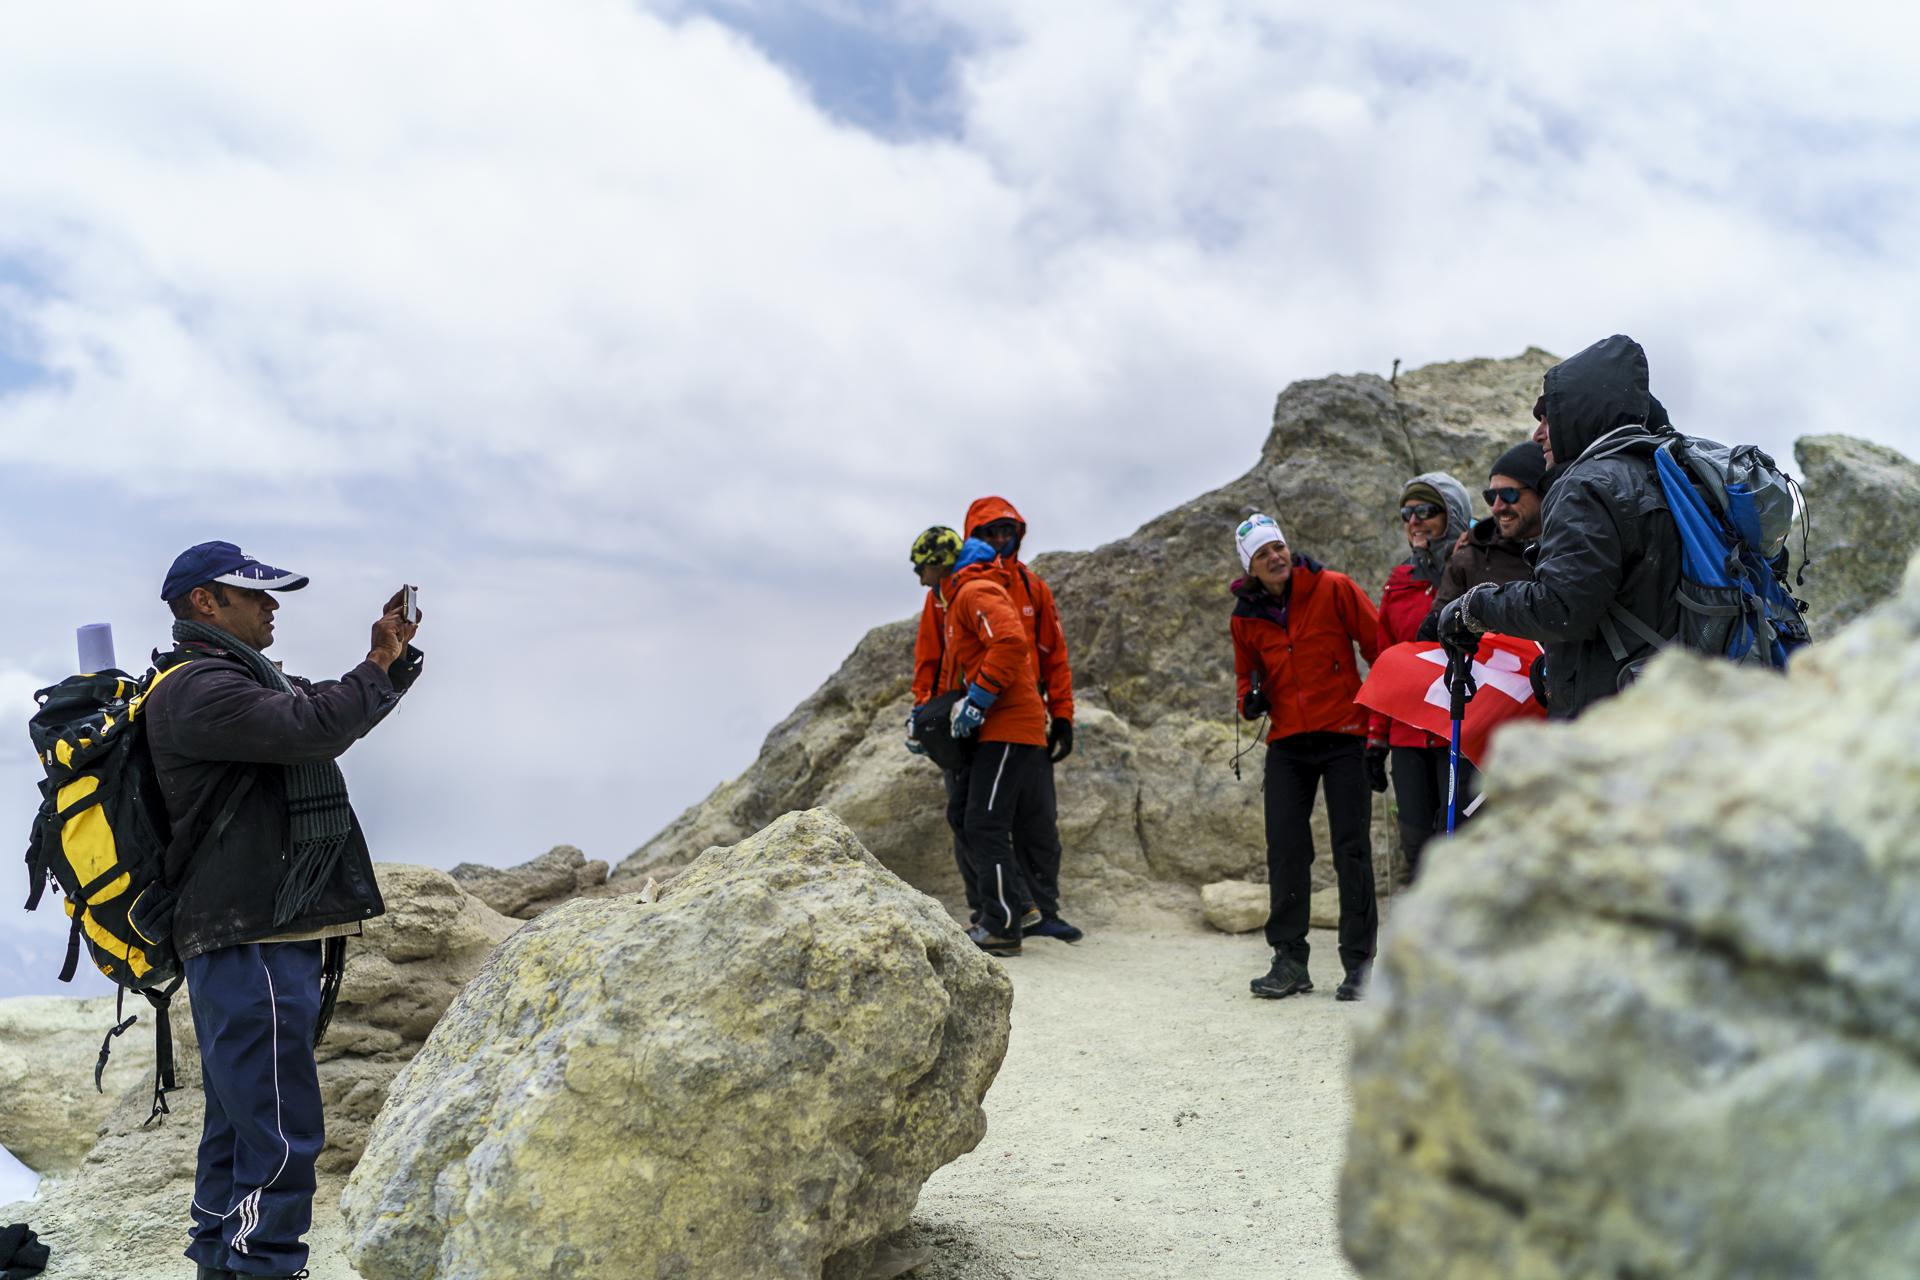 Gipfelfoto Damavand